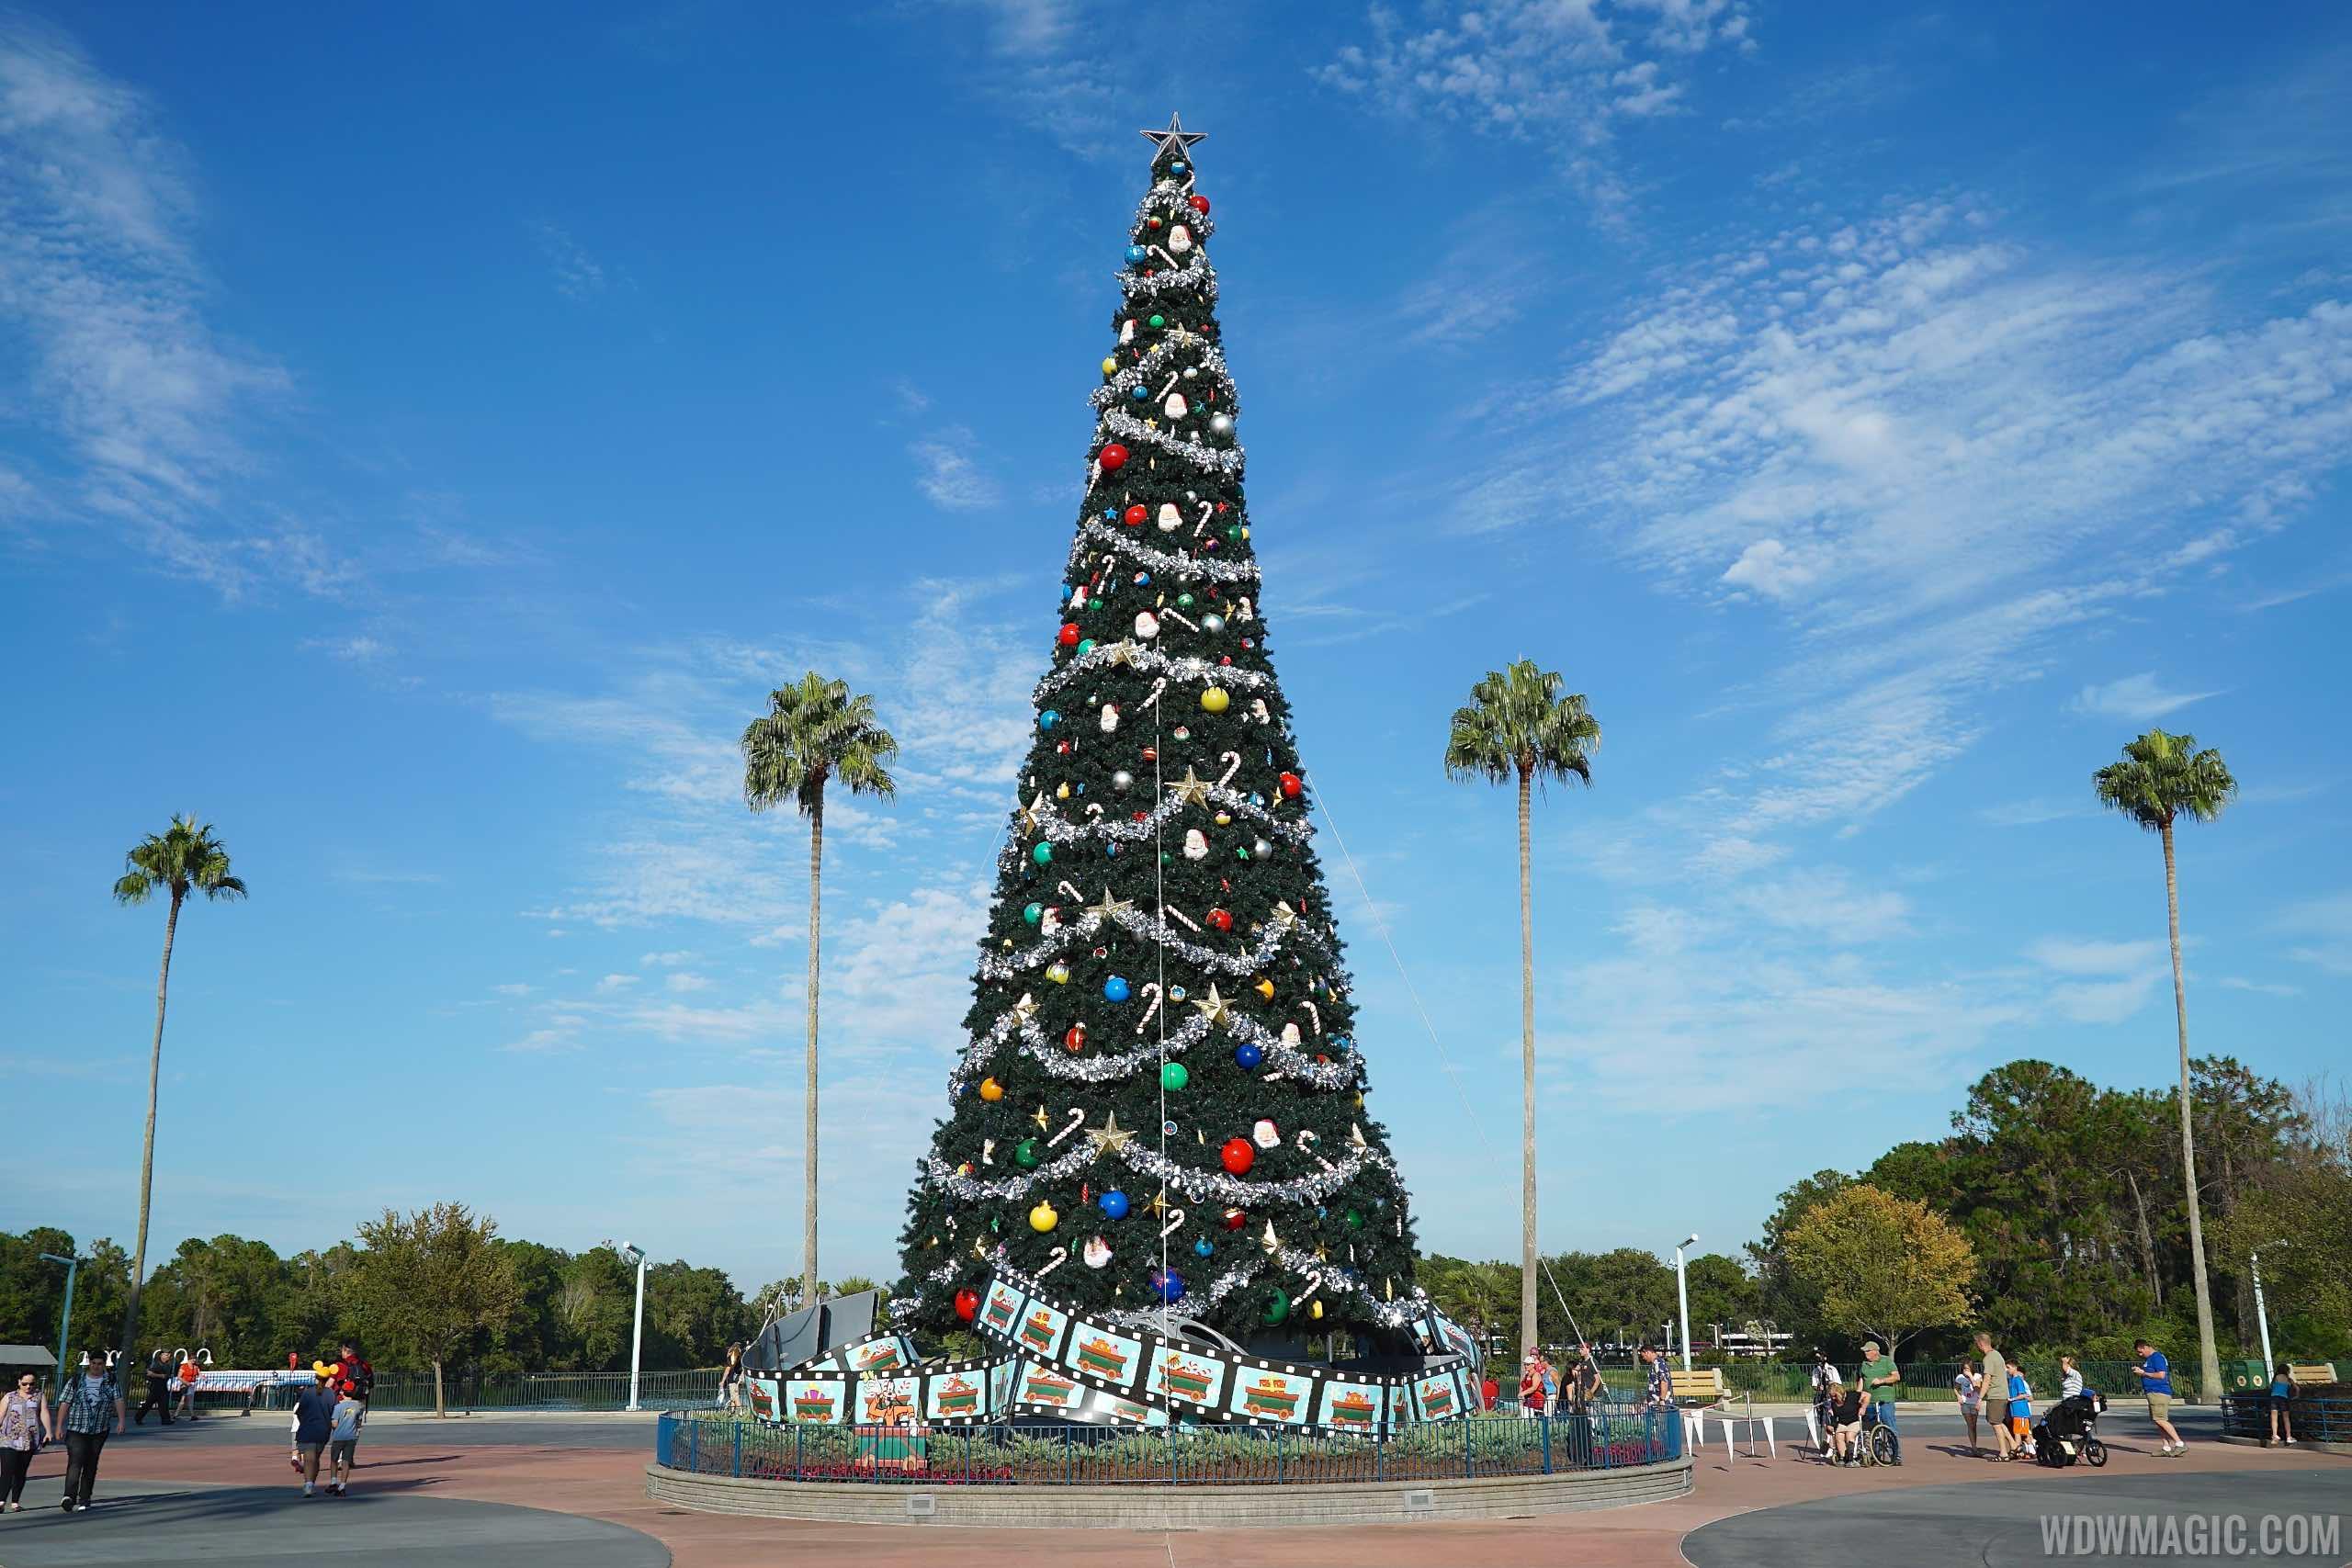 holidays at disneys hollywood studios overview - Disney Christmas 2015